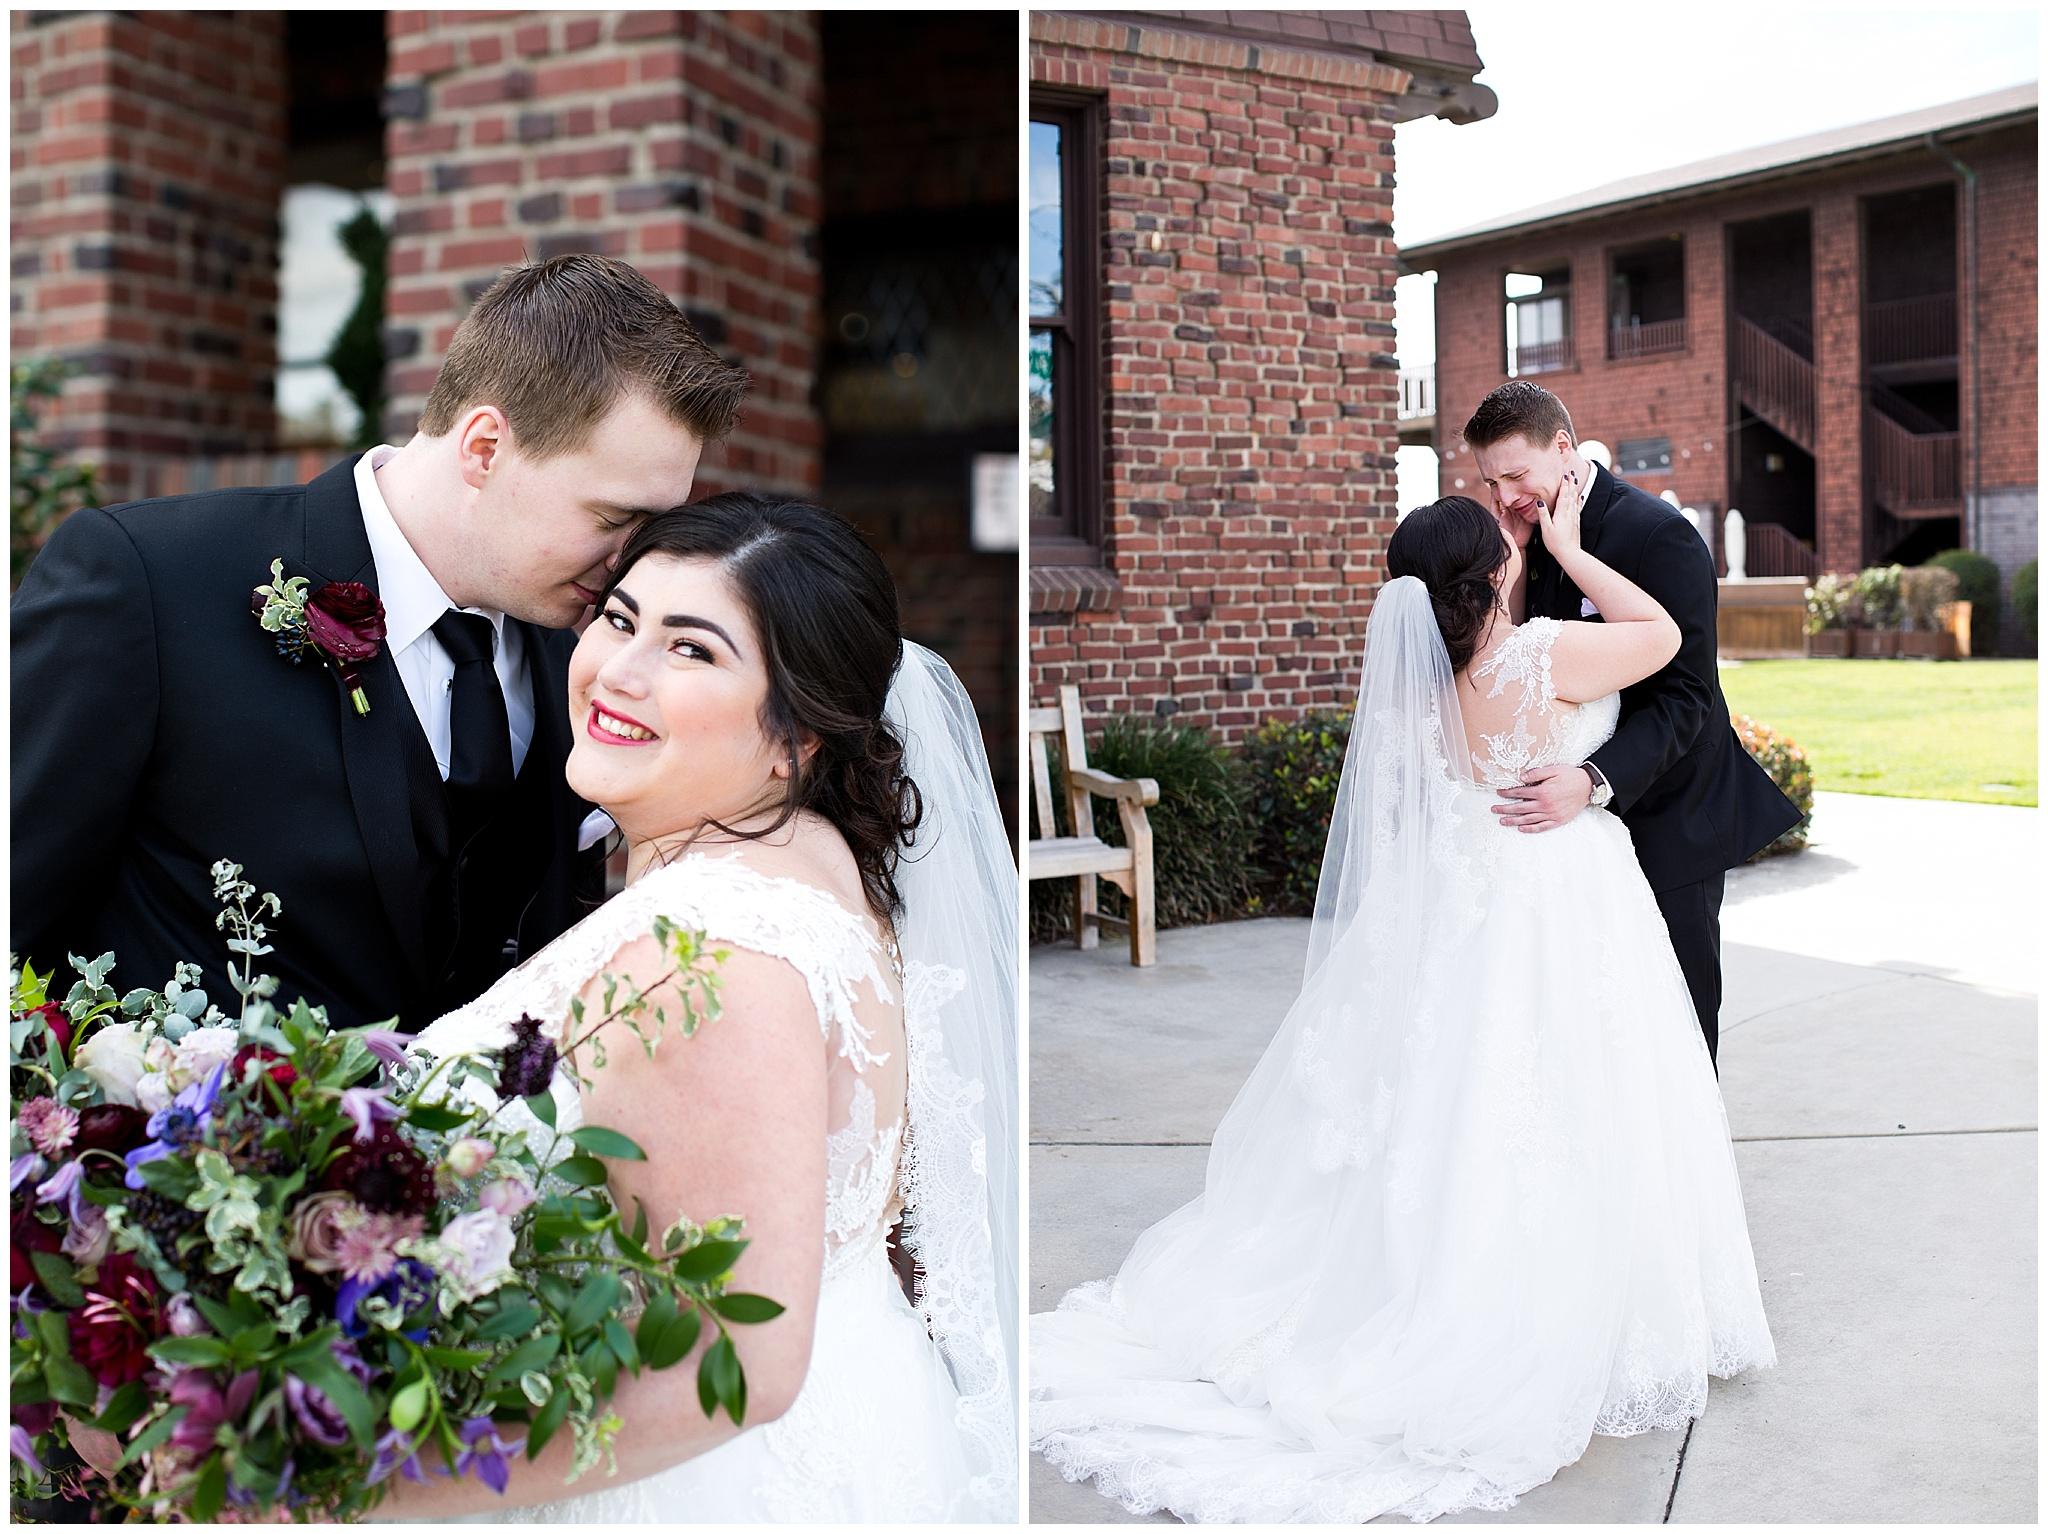 Carol_and_Grant_Wedding_3-3-18-7385-1.jpg